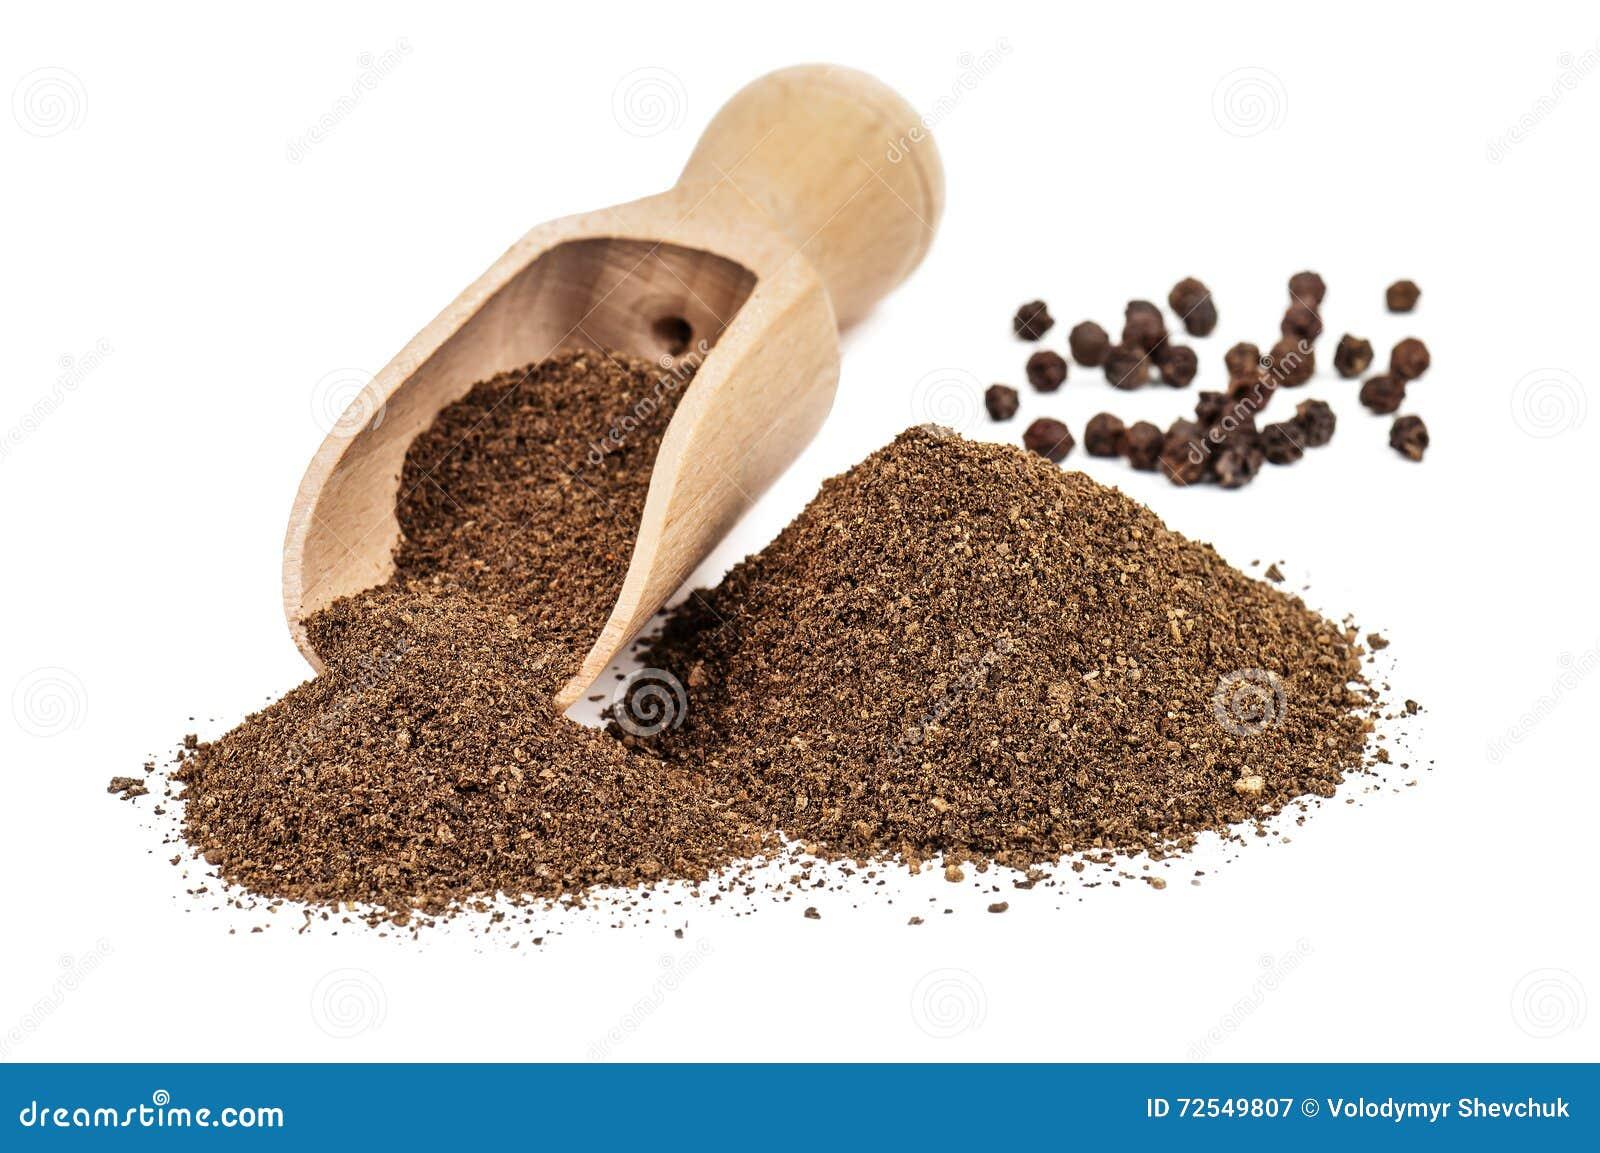 Black pepper ground